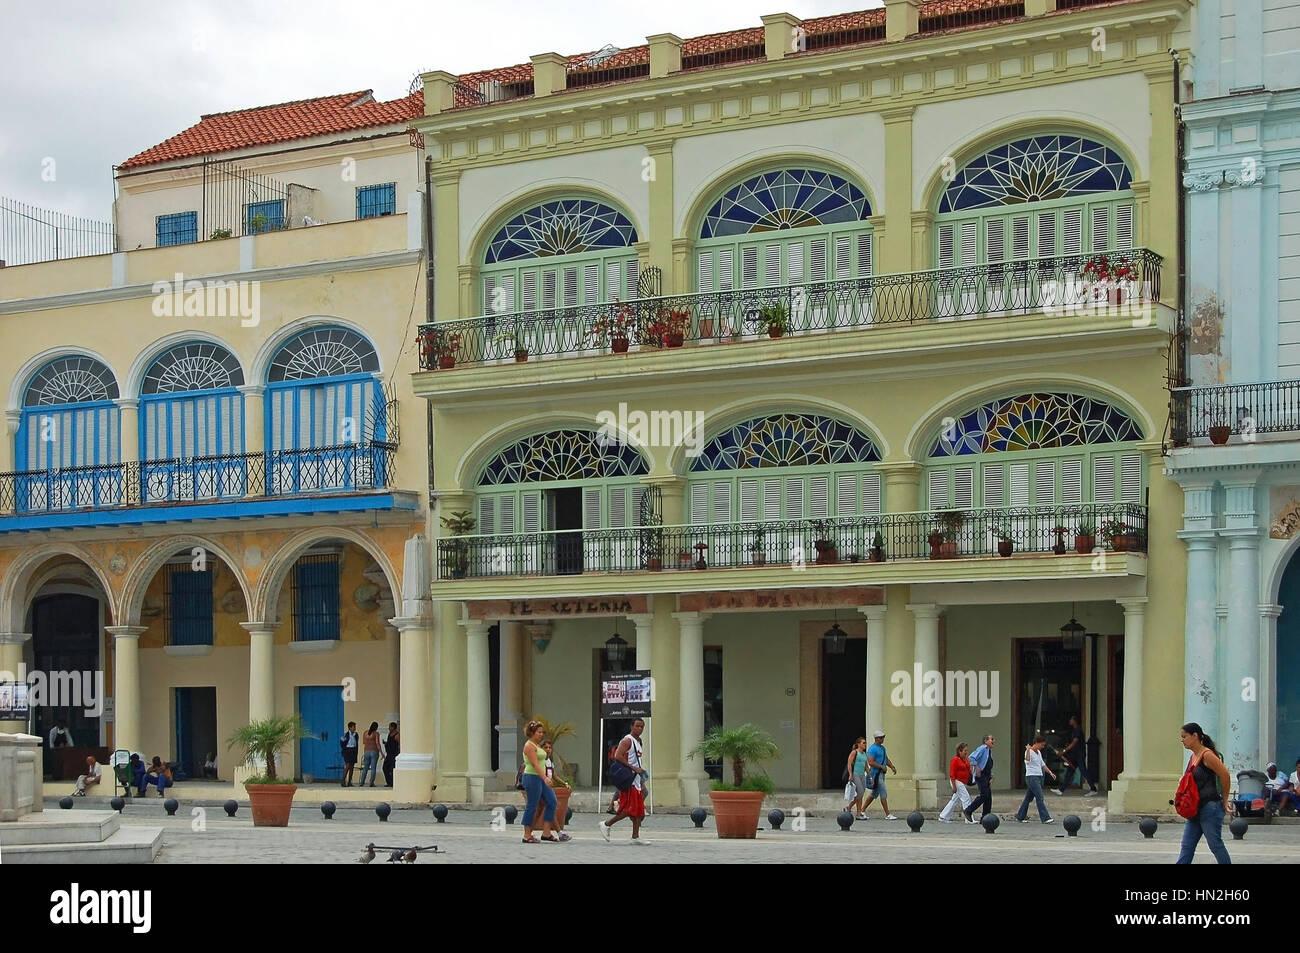 Facade of Casa de Manuel Antuve in Plaza Vieja, Old Havana, Cuba Stock Photo